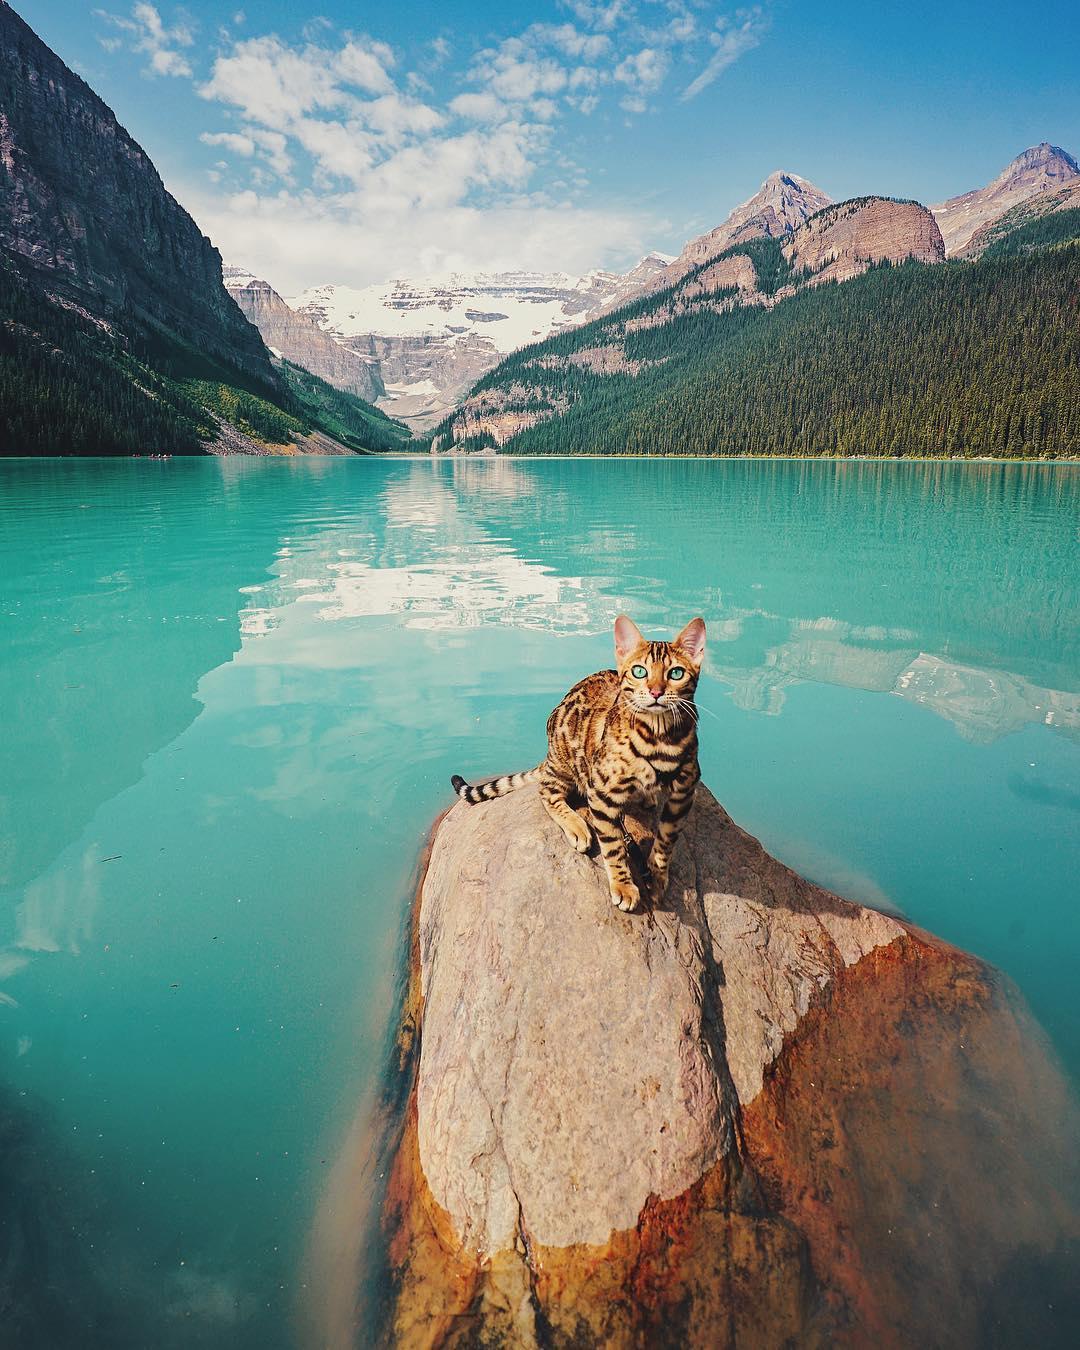 عکس گربه از نژاد بنگال